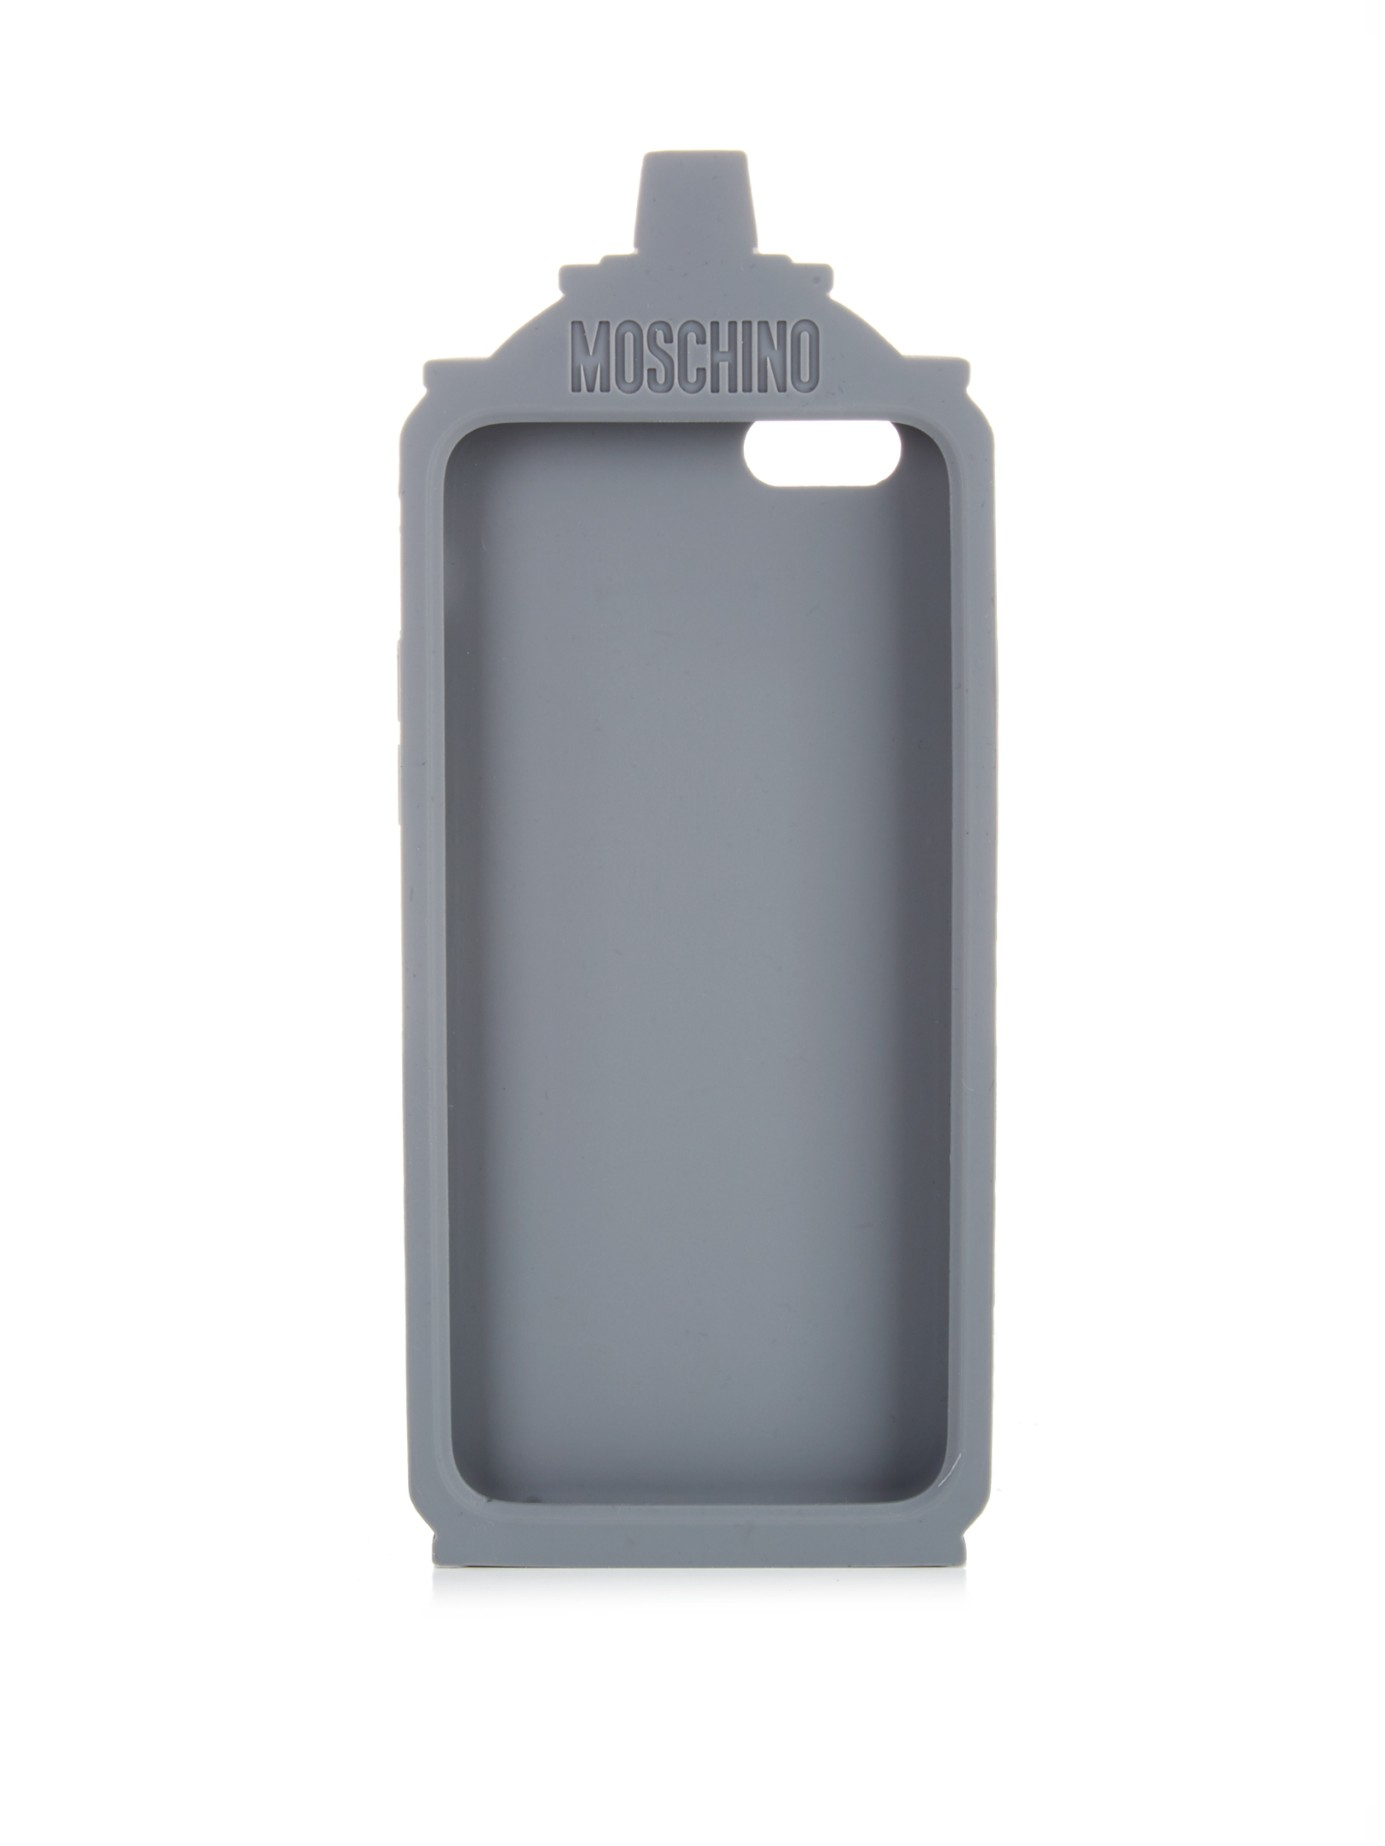 Moschino Spray Iphone Case